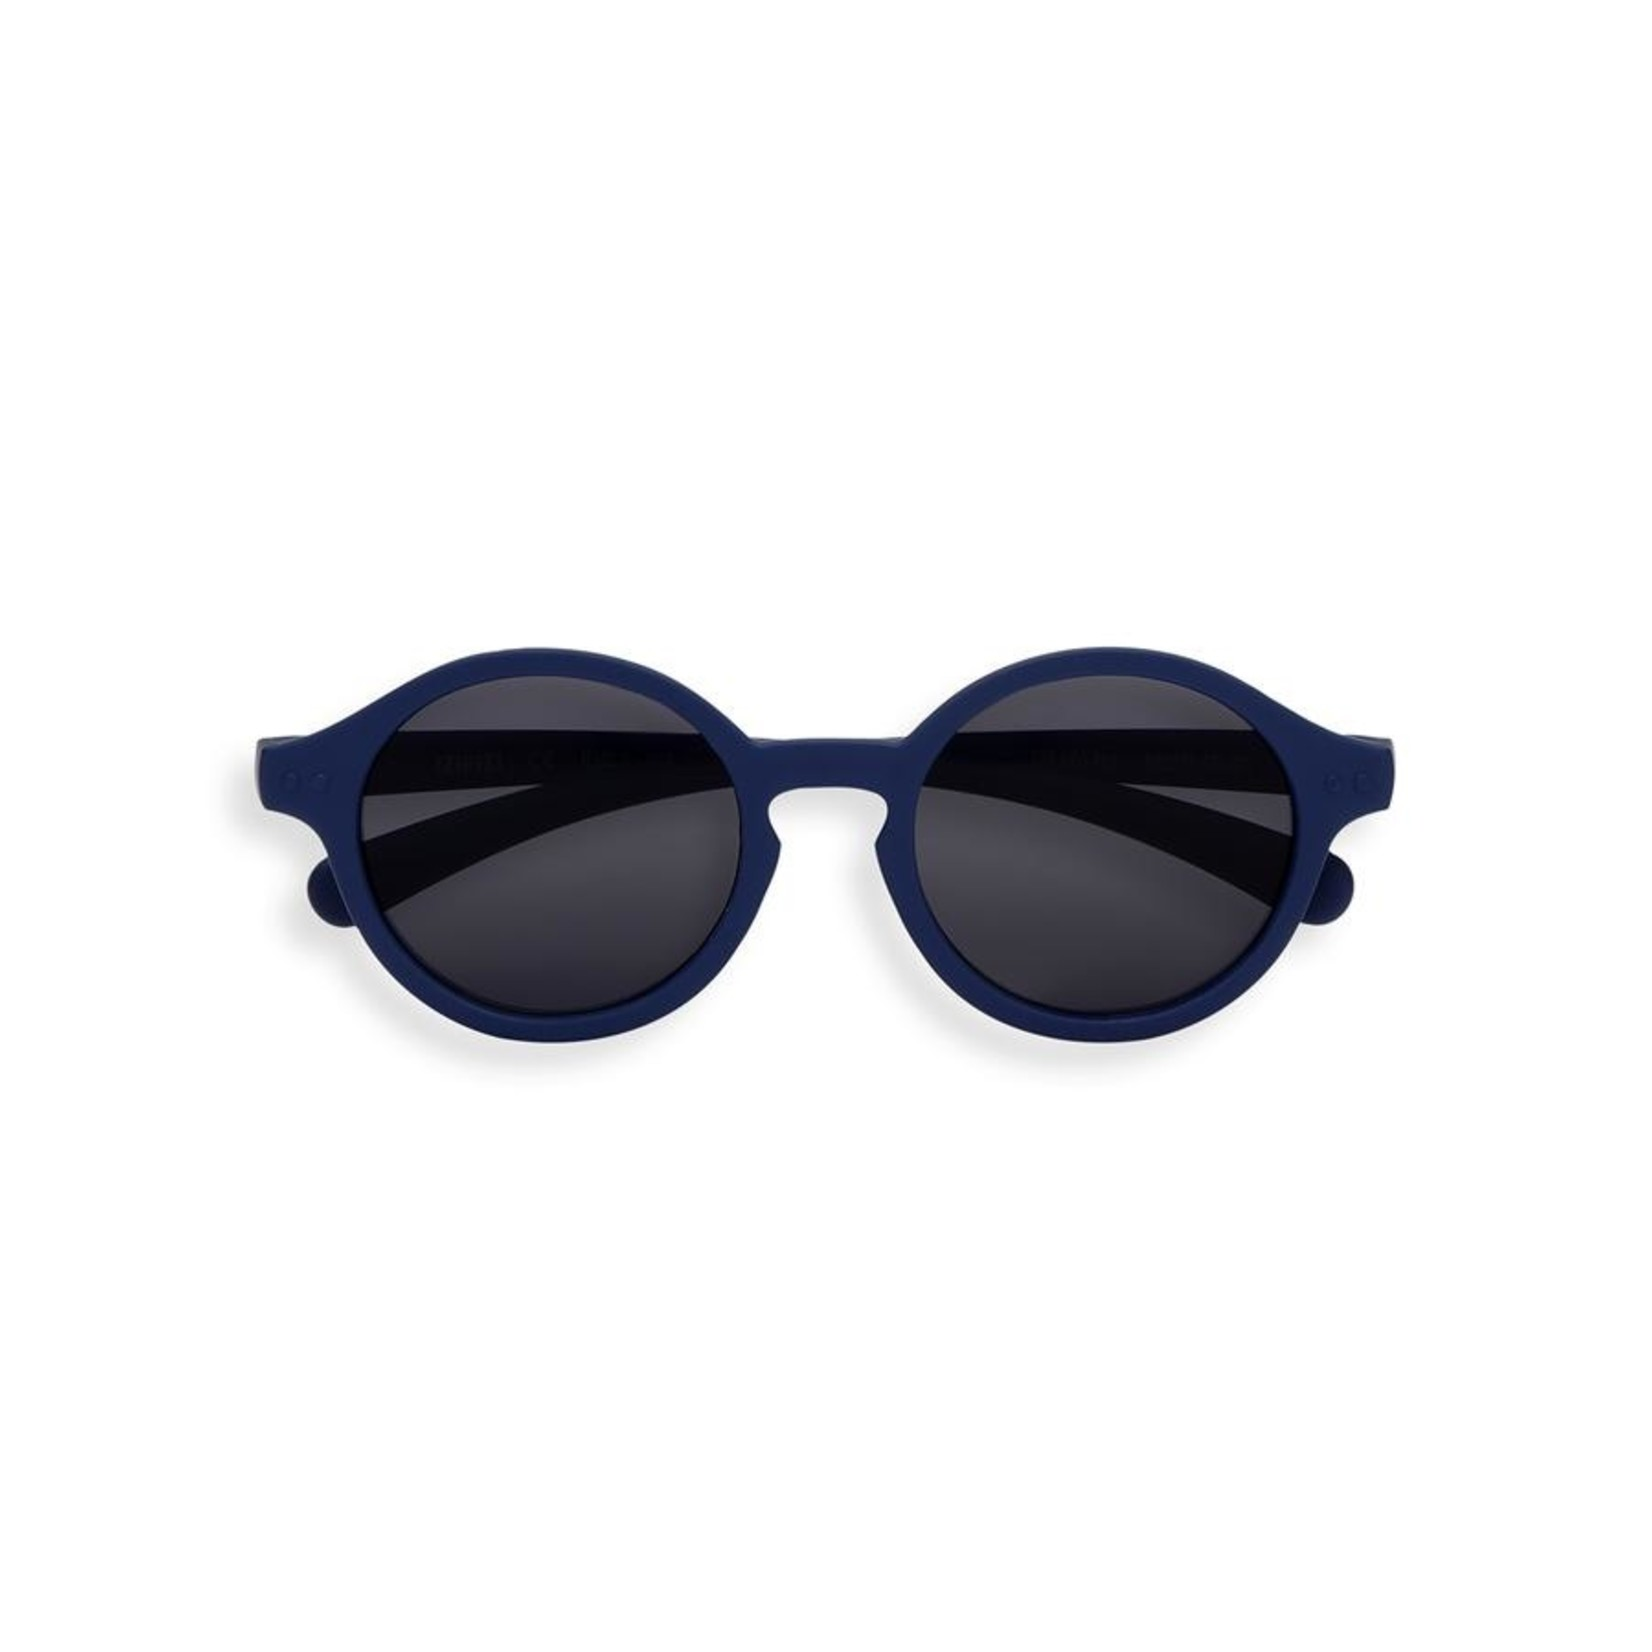 IZIPIZI Izipizi Kids Plus Sunglasses Denim Blue - Polarized